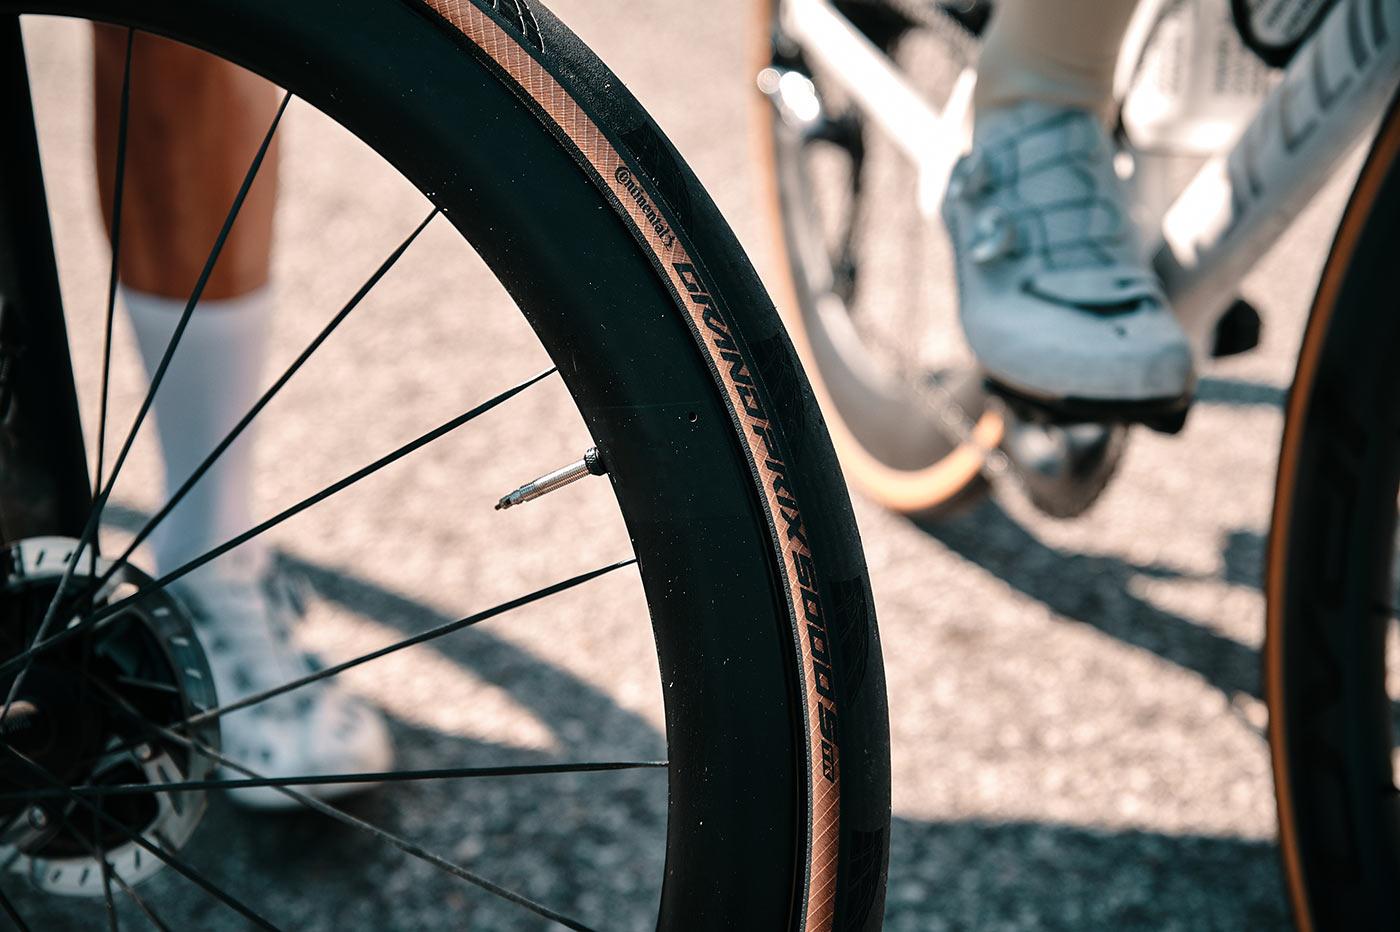 tubeless ready Continental Gran Prix 5000 S TR road bike tire